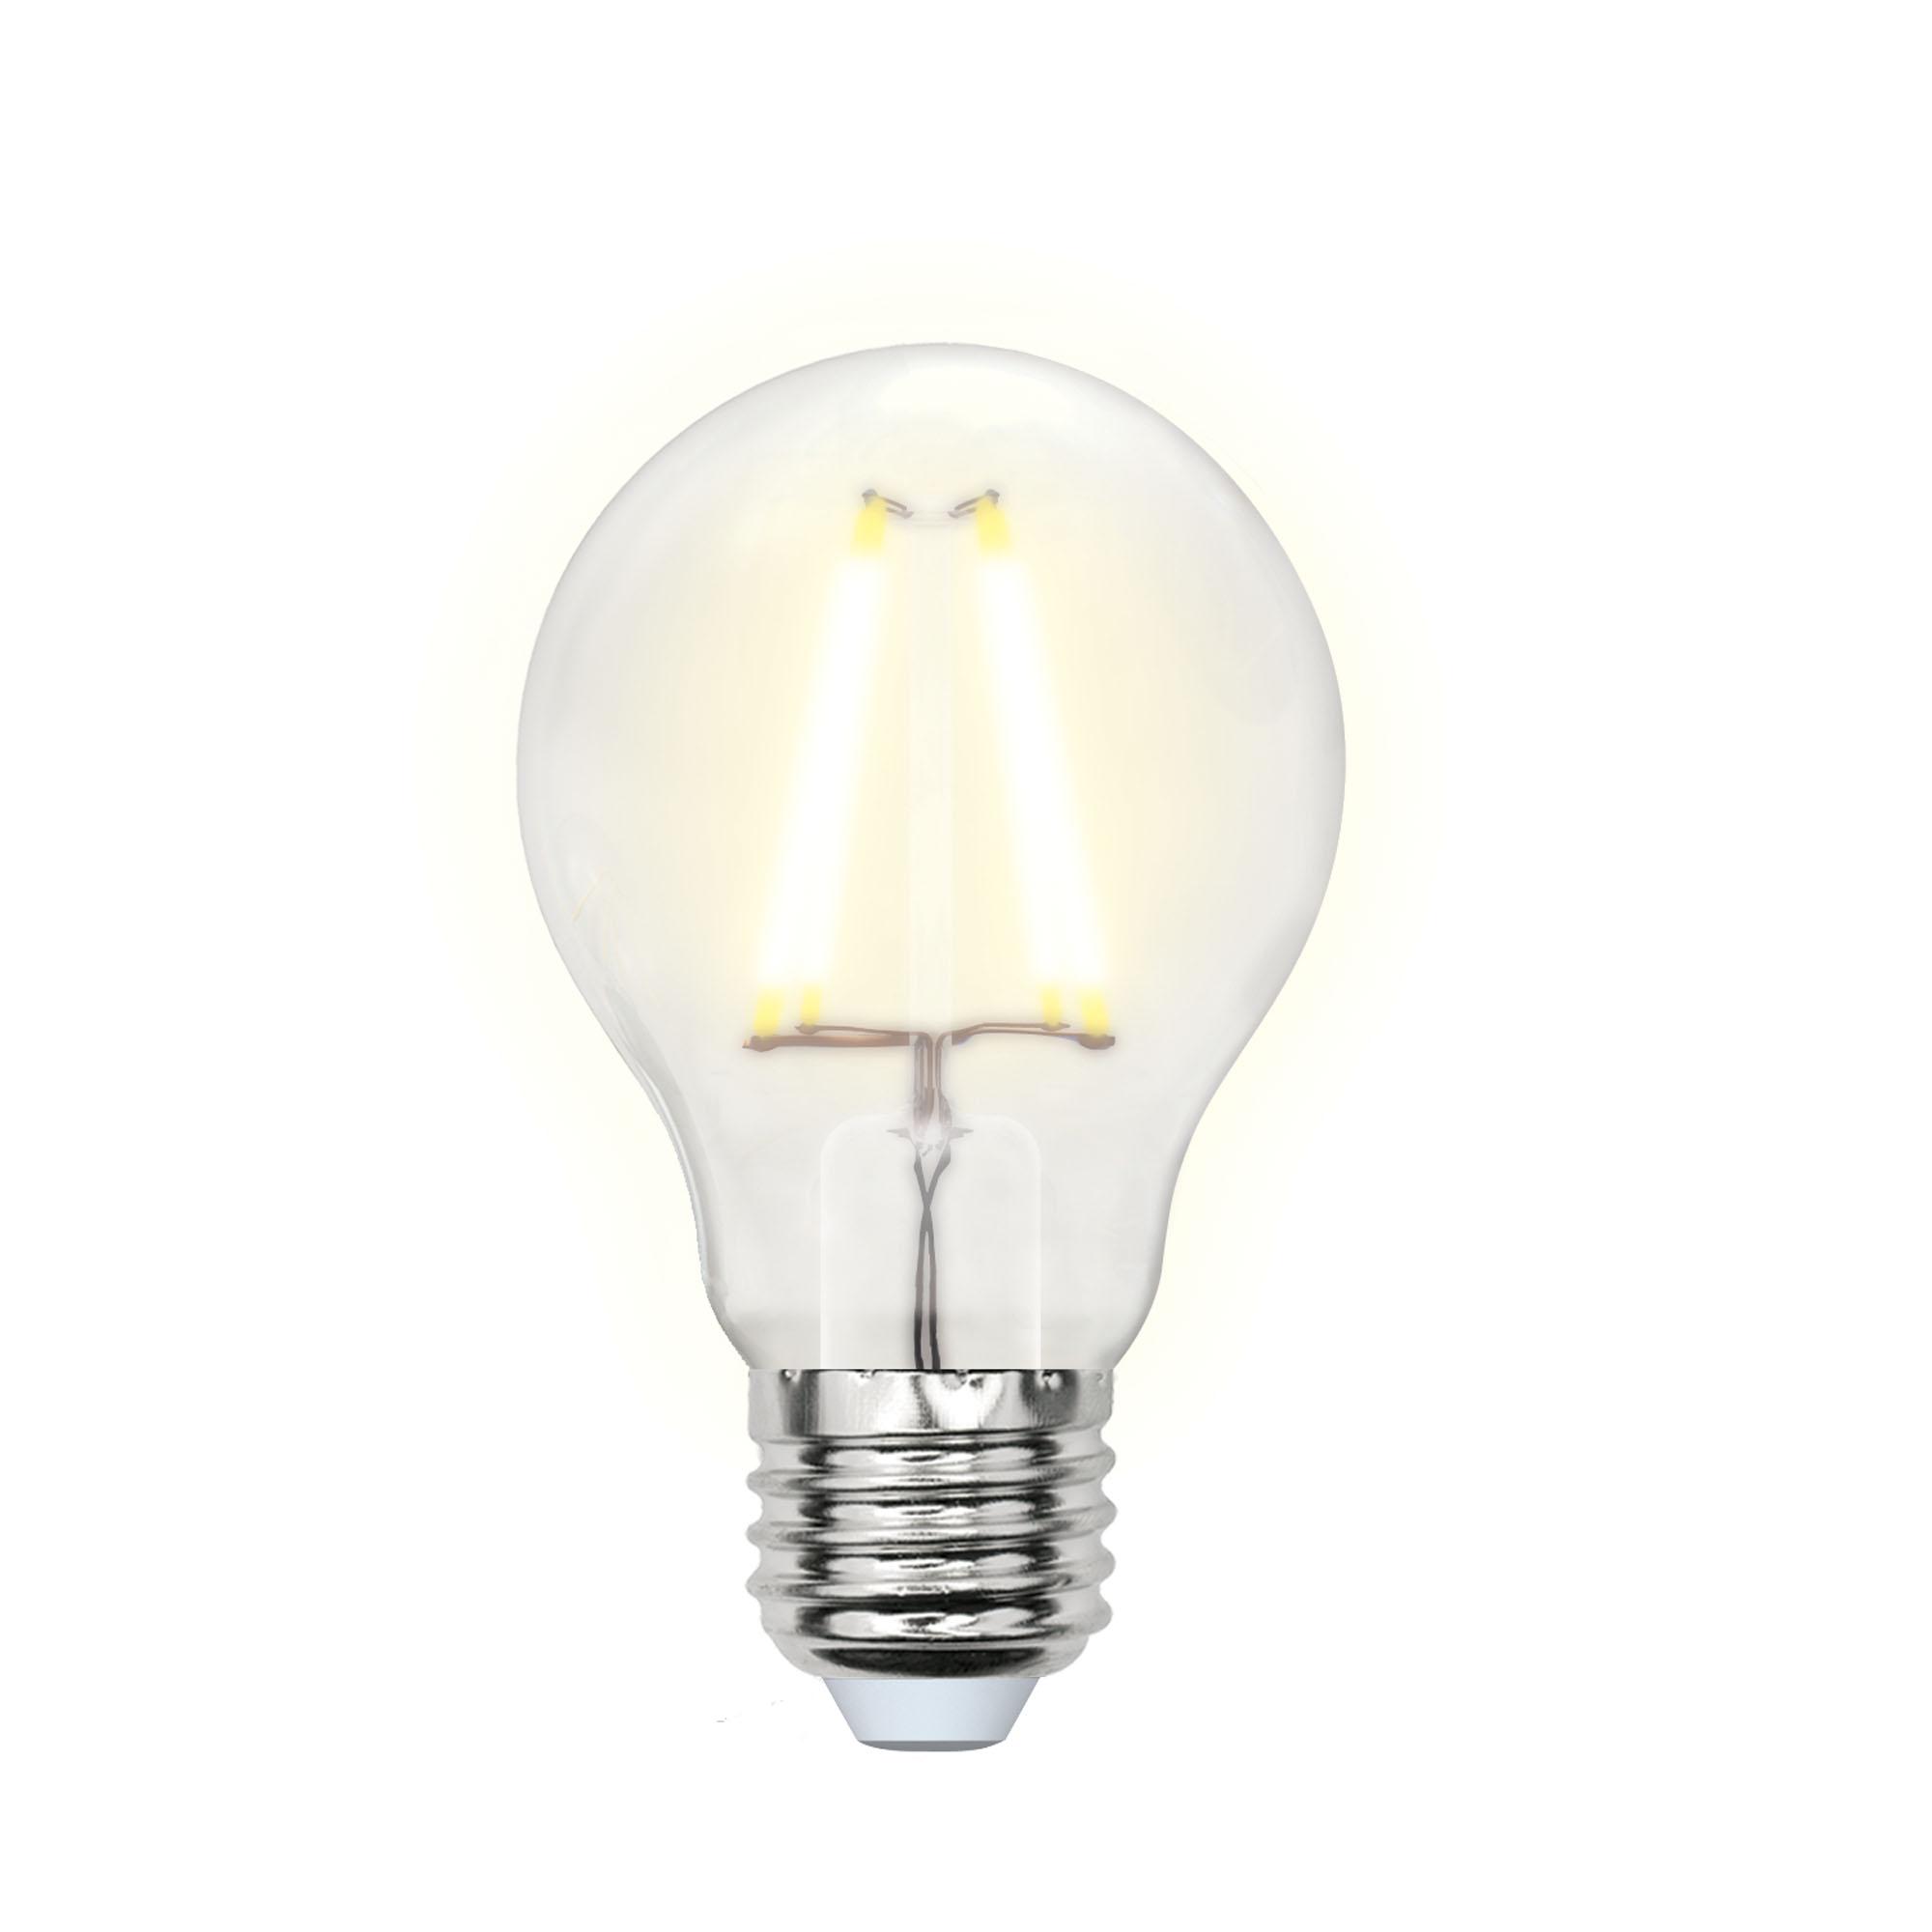 Лампа светодиодная Uniel Led-a60-8w/ww/e27/fr pls02wh 10шт